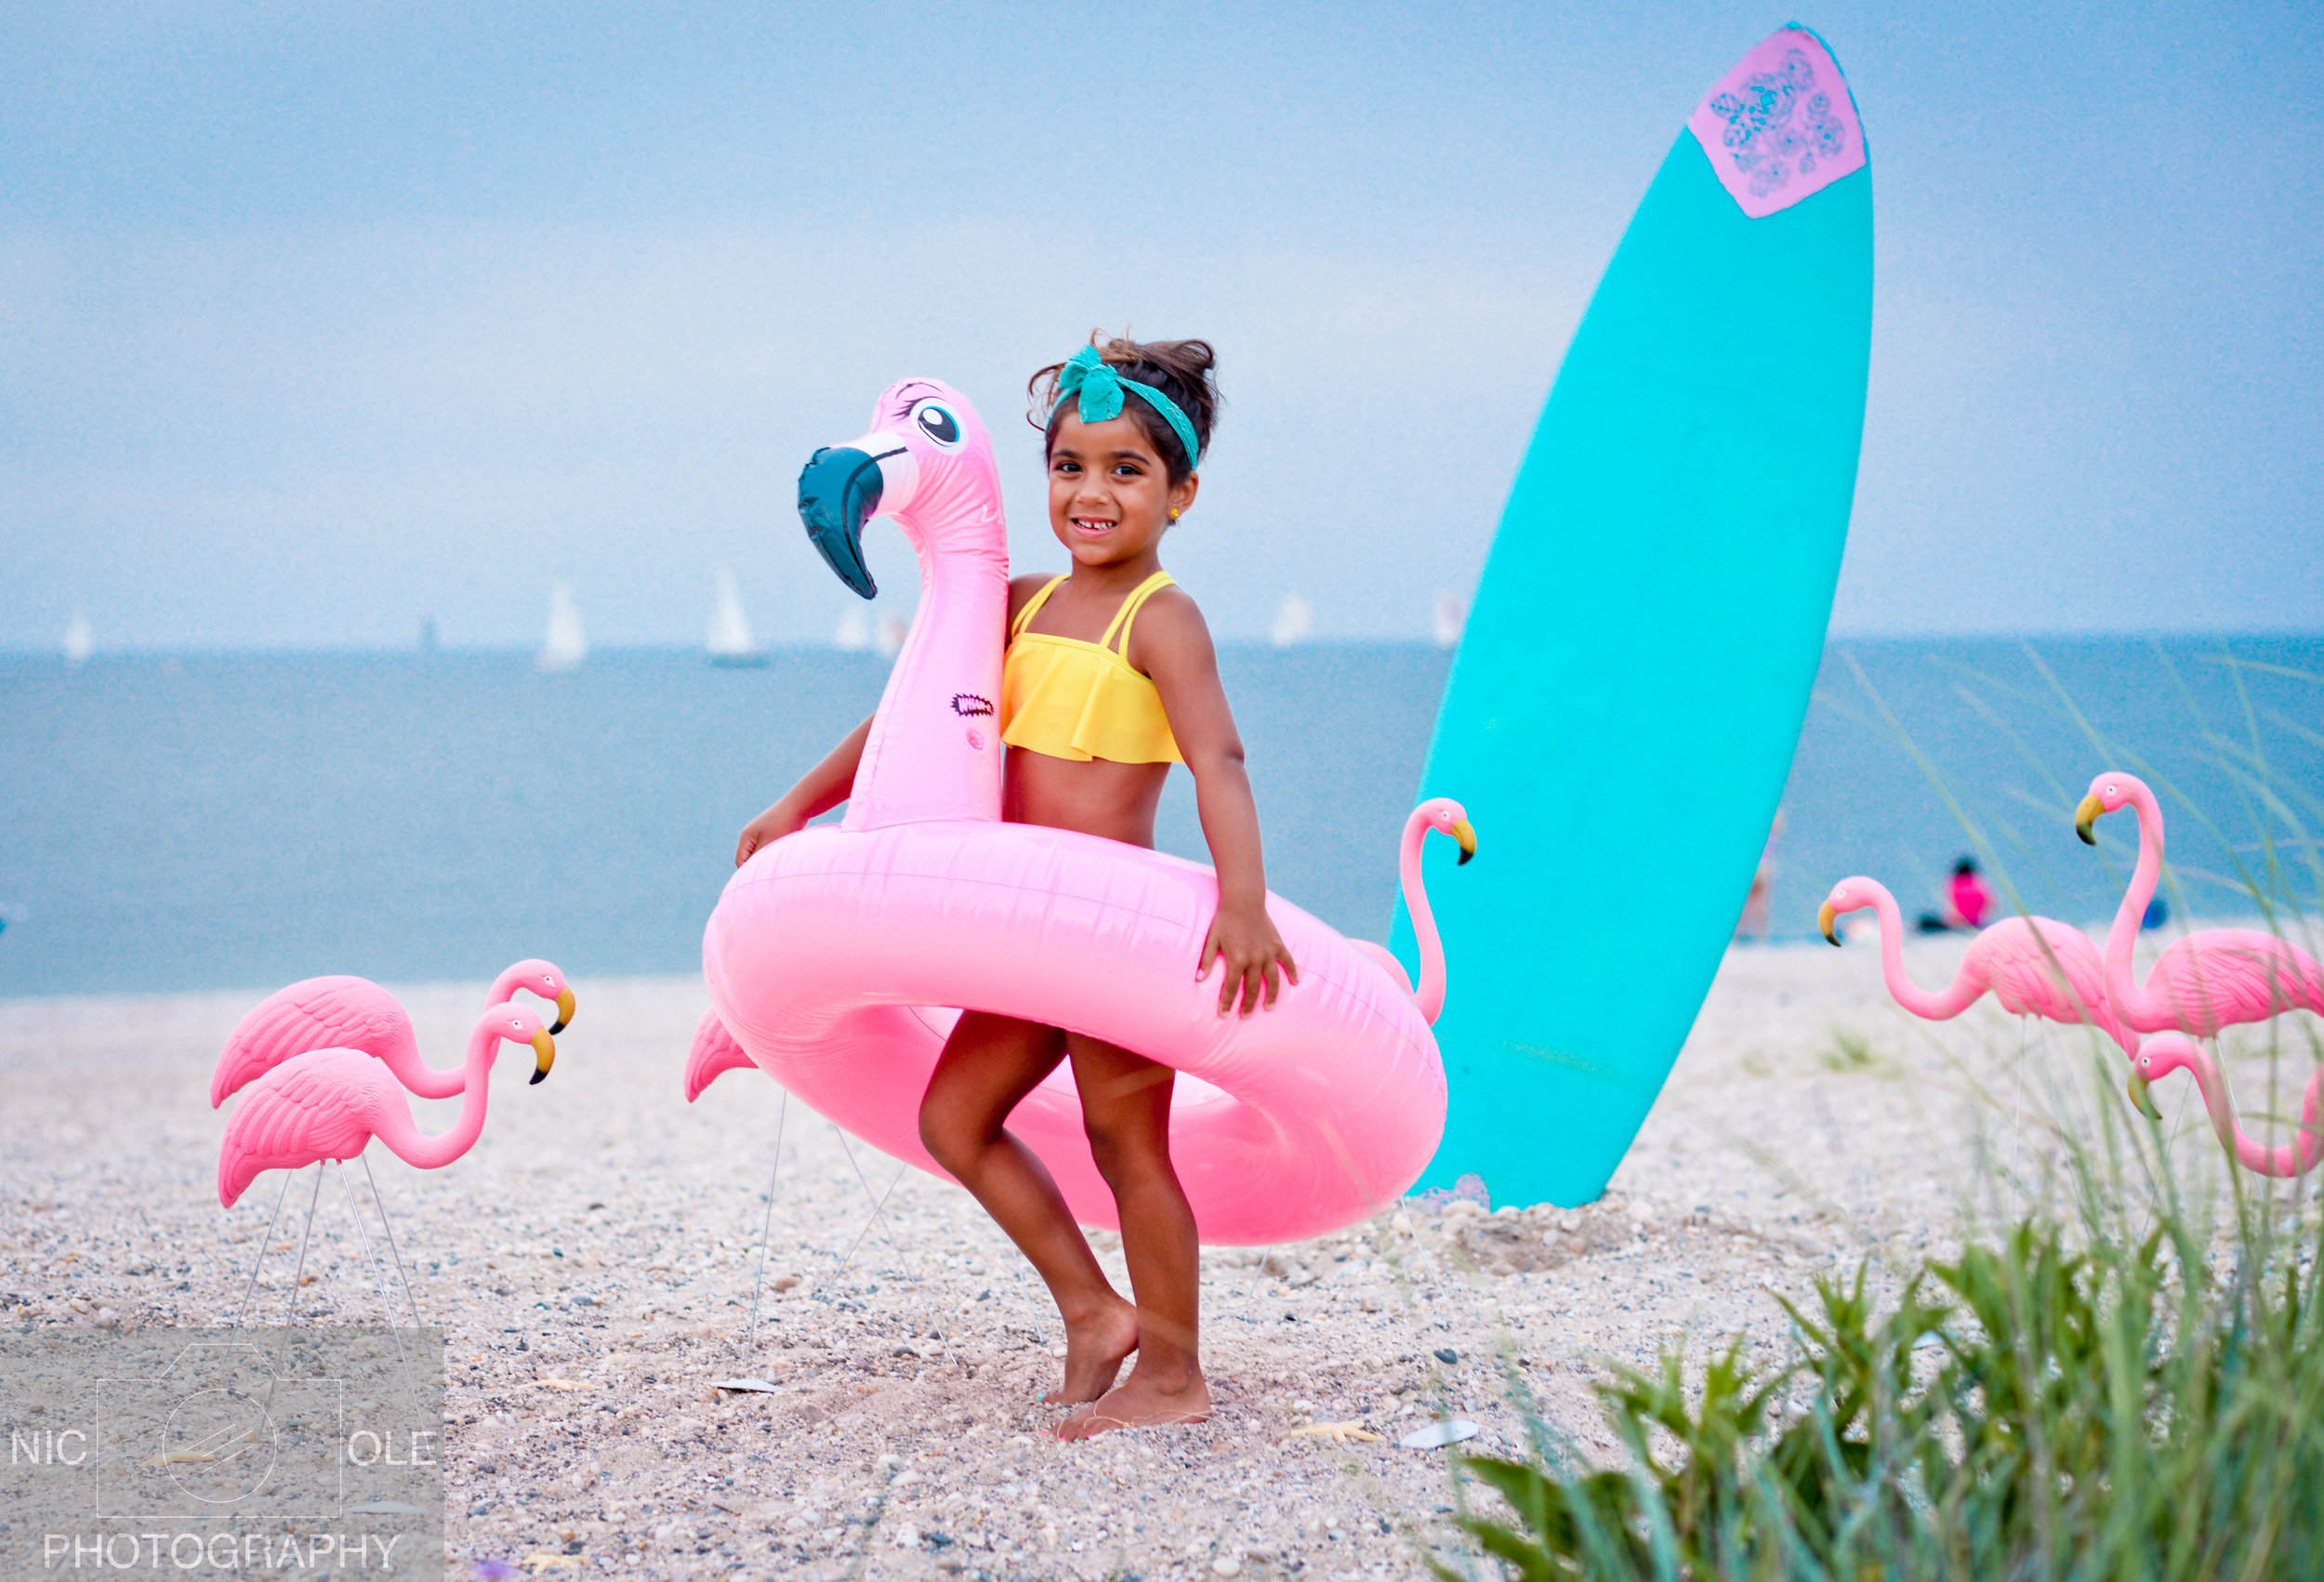 Cielo Noemi Flamingo Beach 7.20.17- NIC-OLE Photography-7.jpg